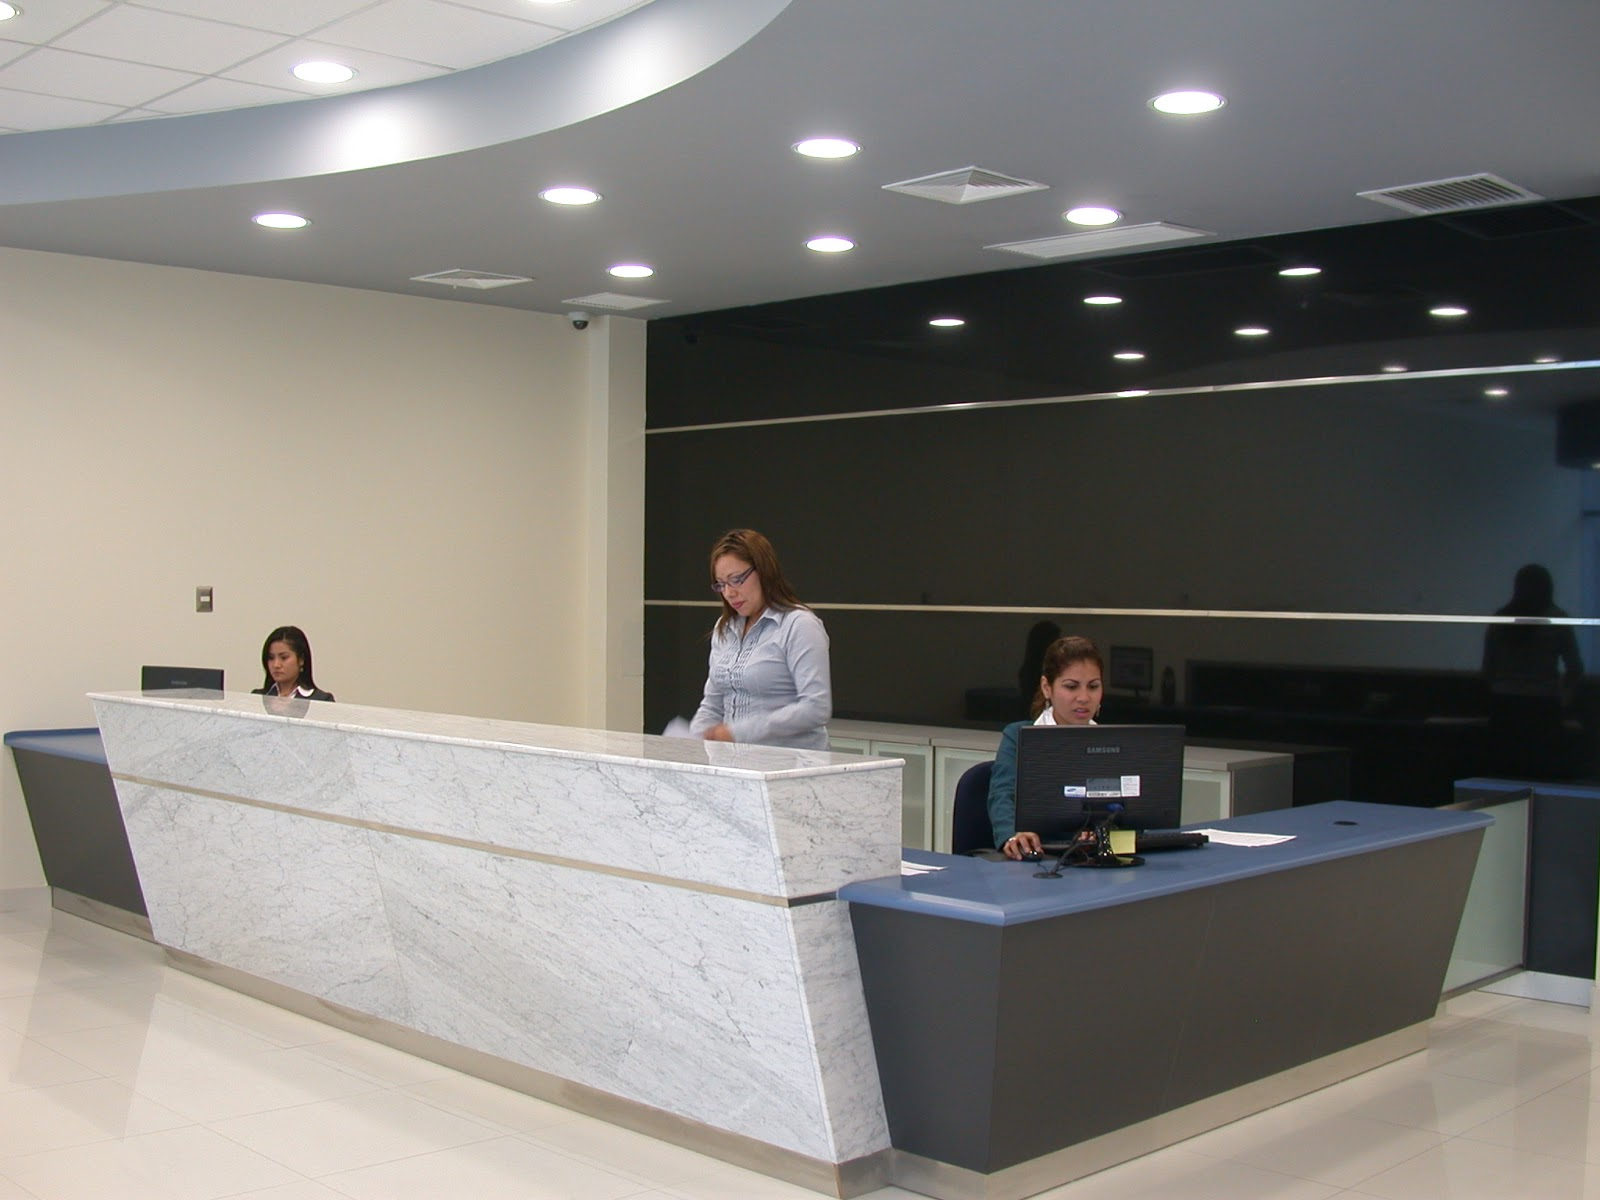 Oniria mobiliario corporativo for Mobiliario recepcion oficina